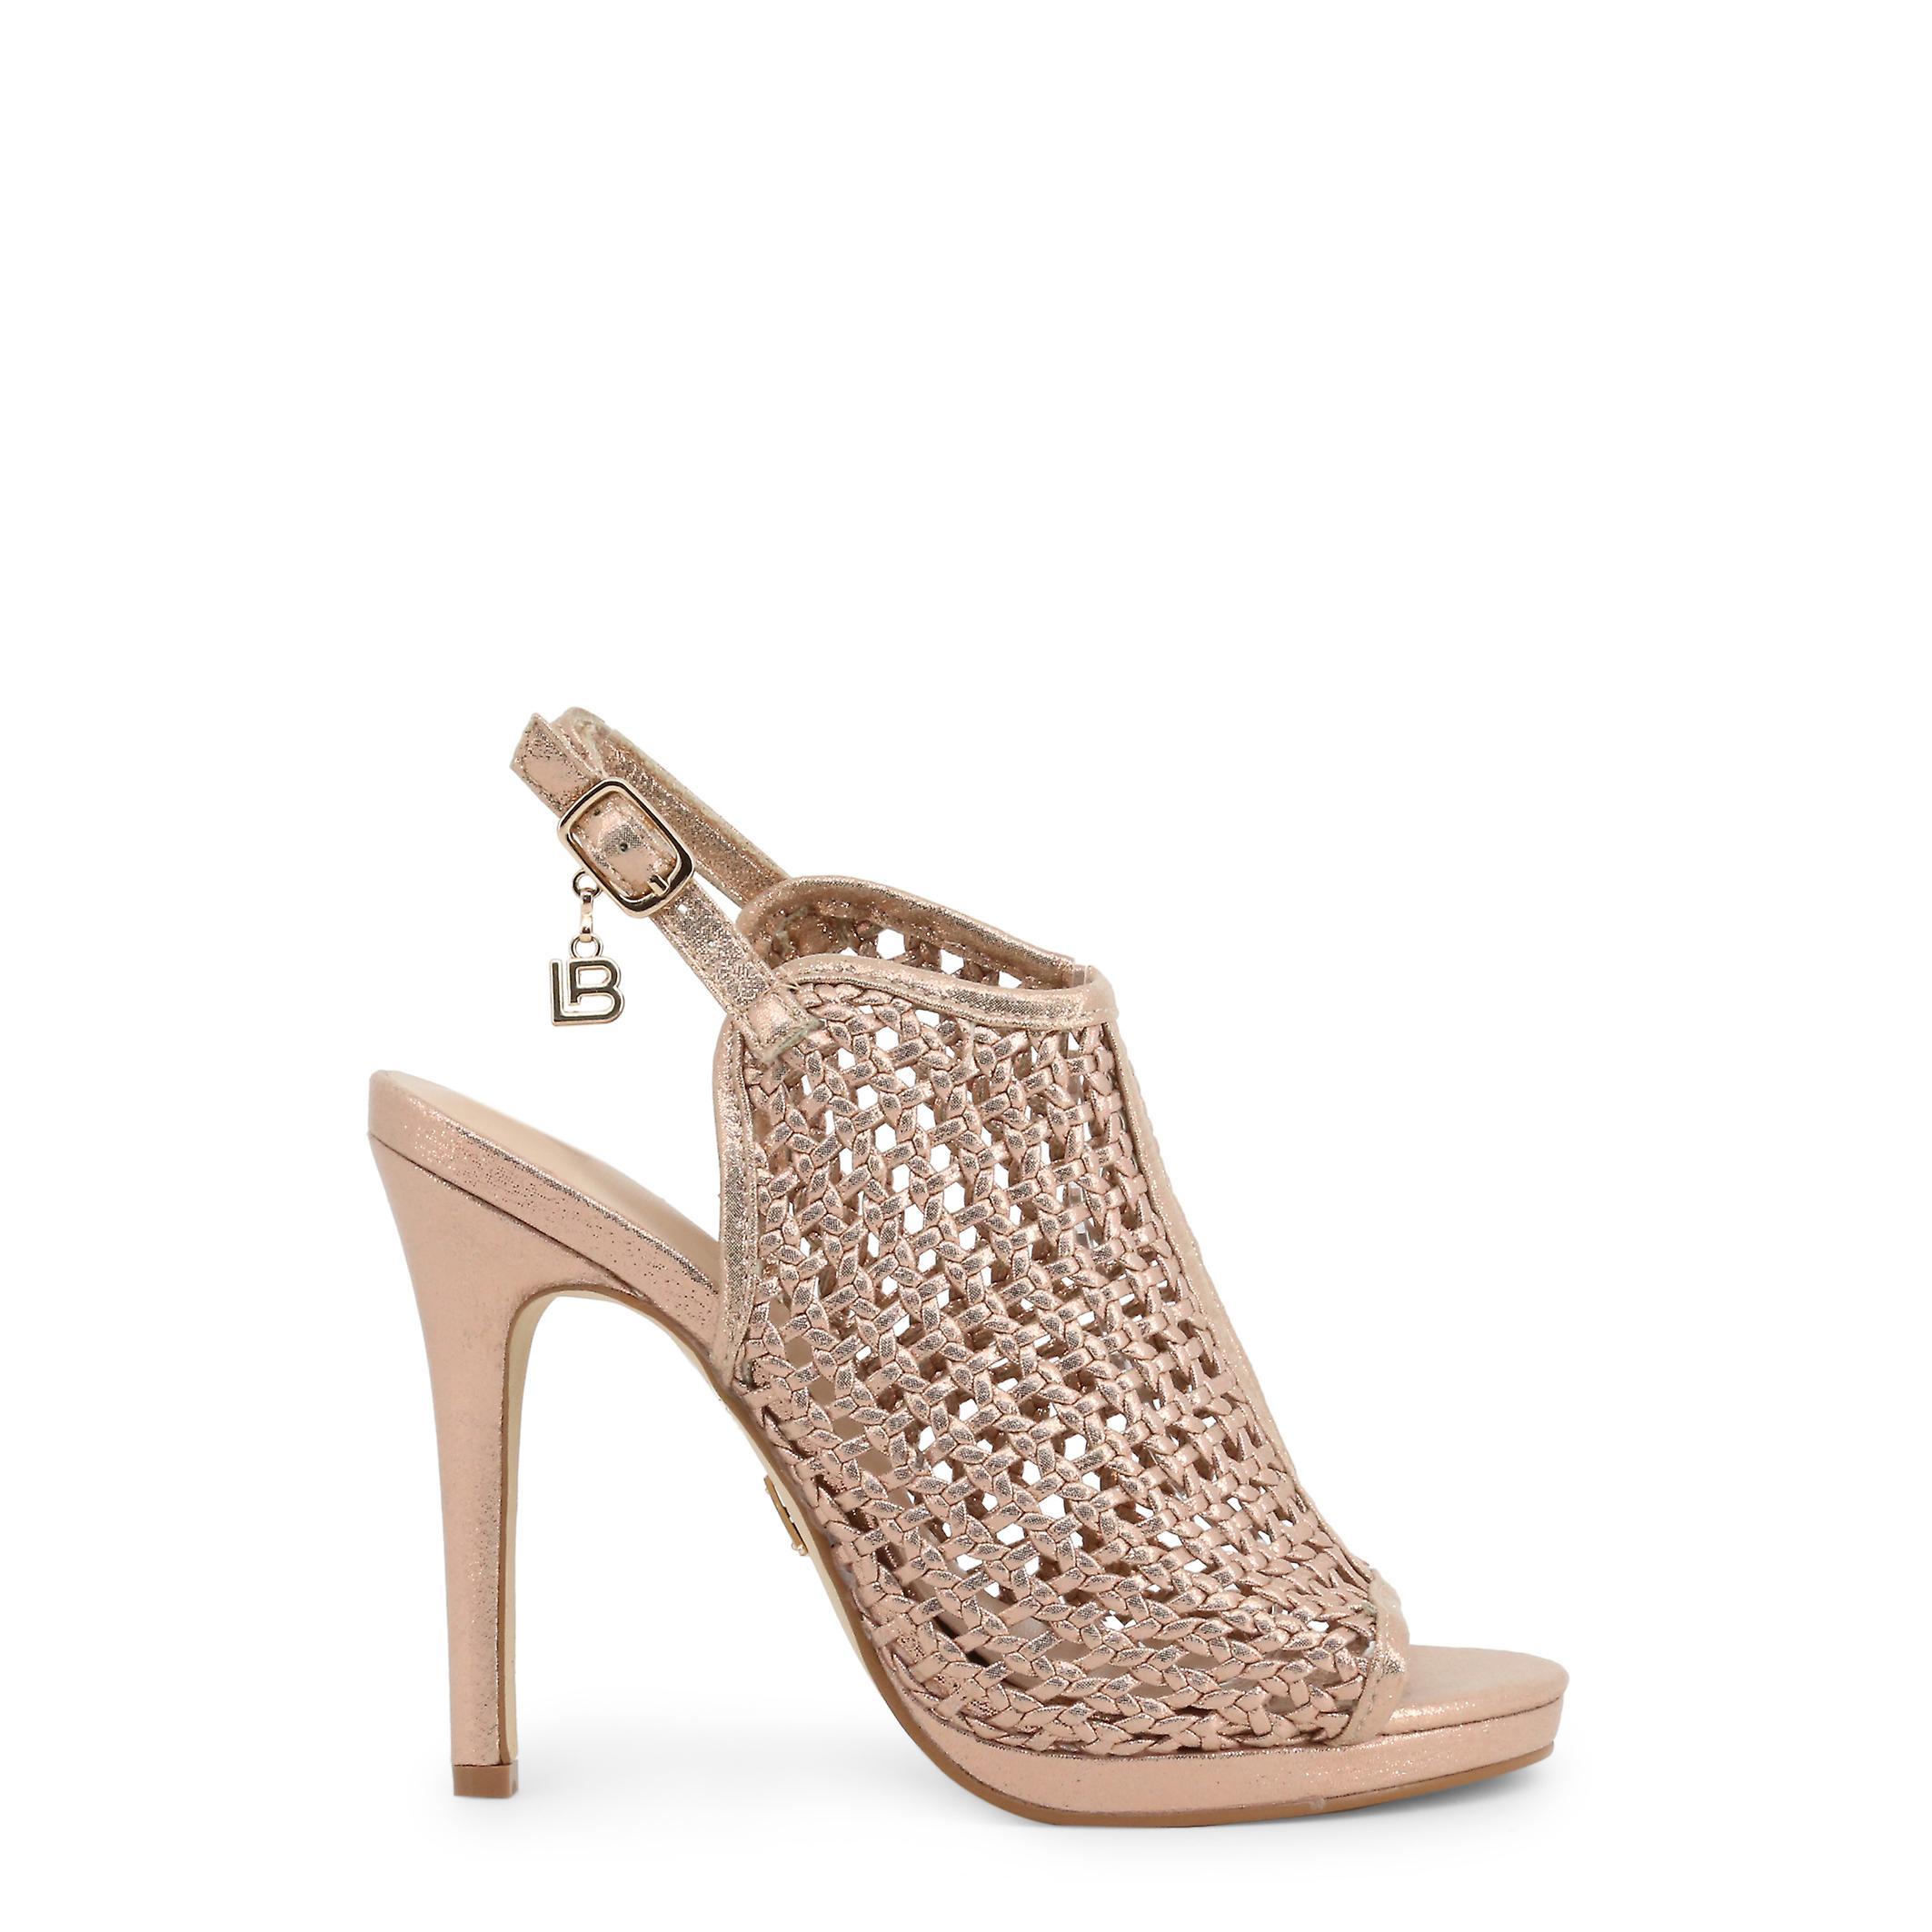 Laura Biagiotti Original Women Spring/Summer Sandals Pink Color - 70116 FkYQp